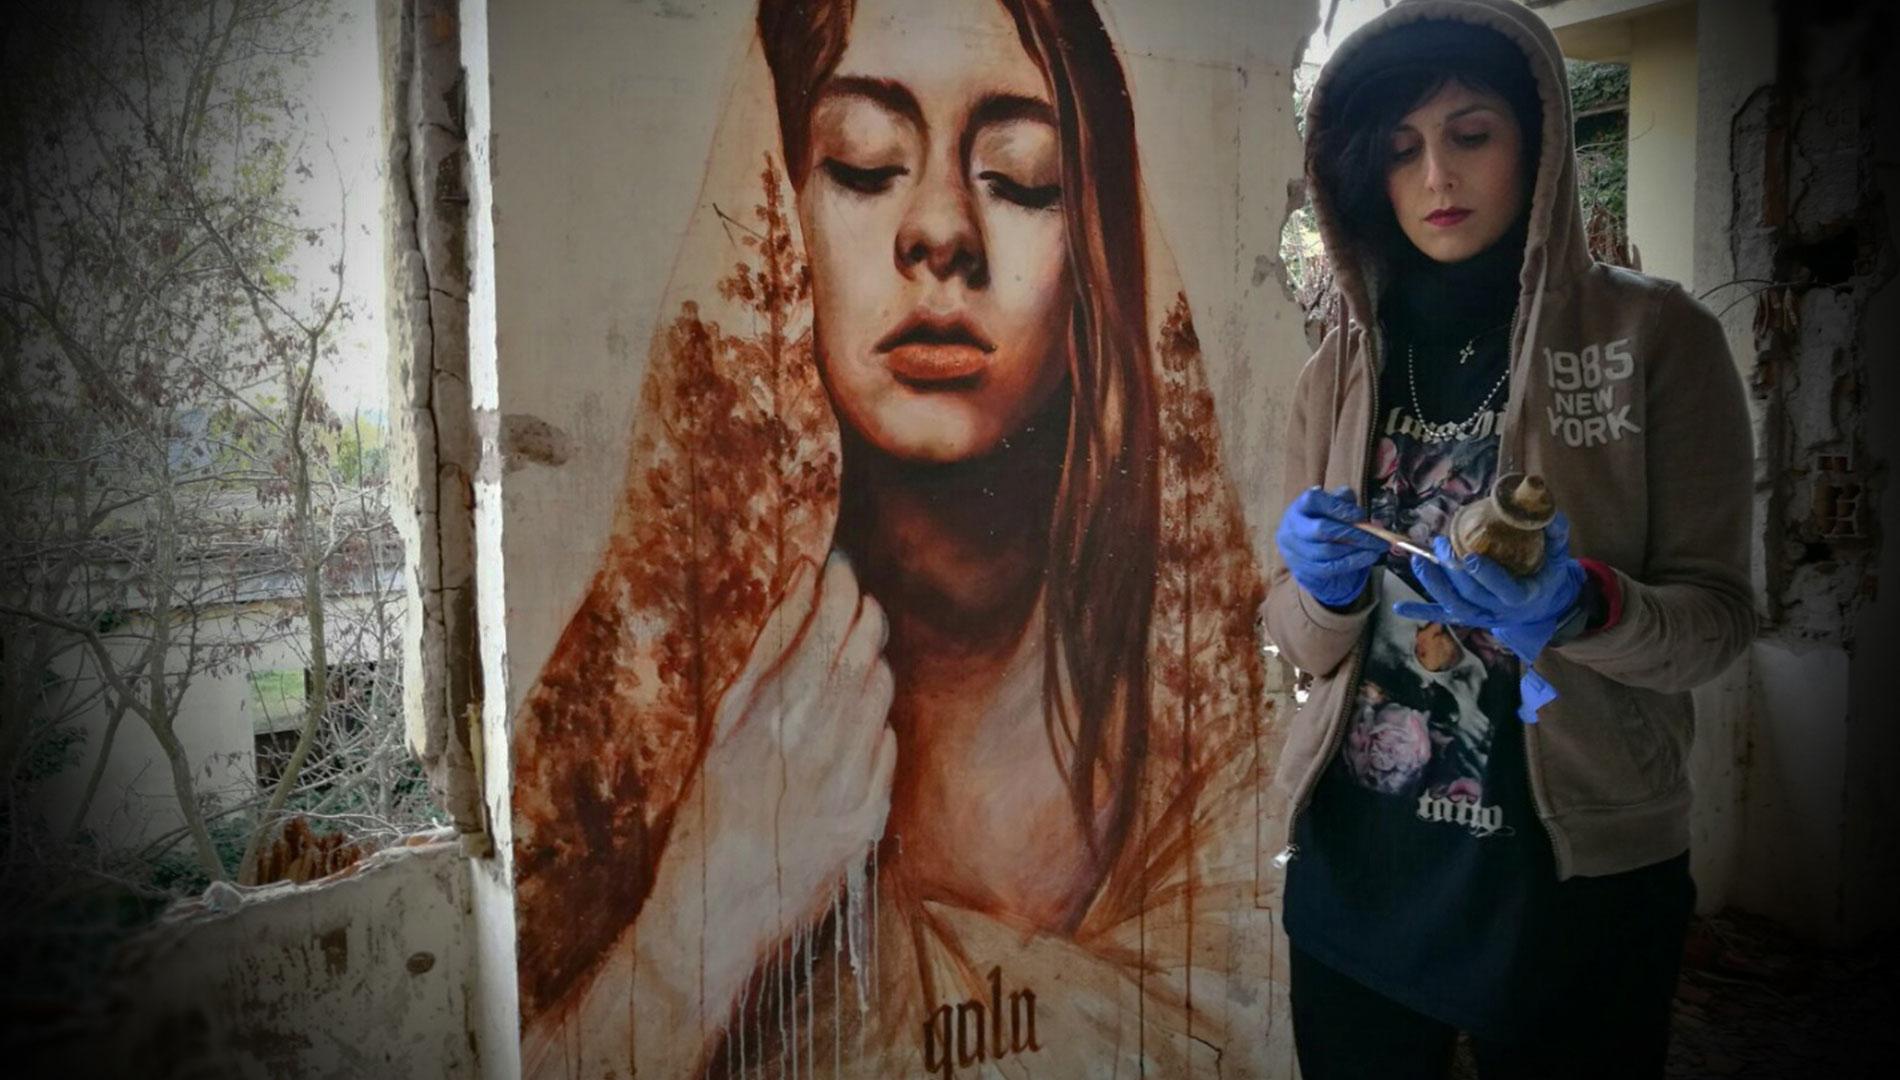 stefania_gala_machines_streetart_roma